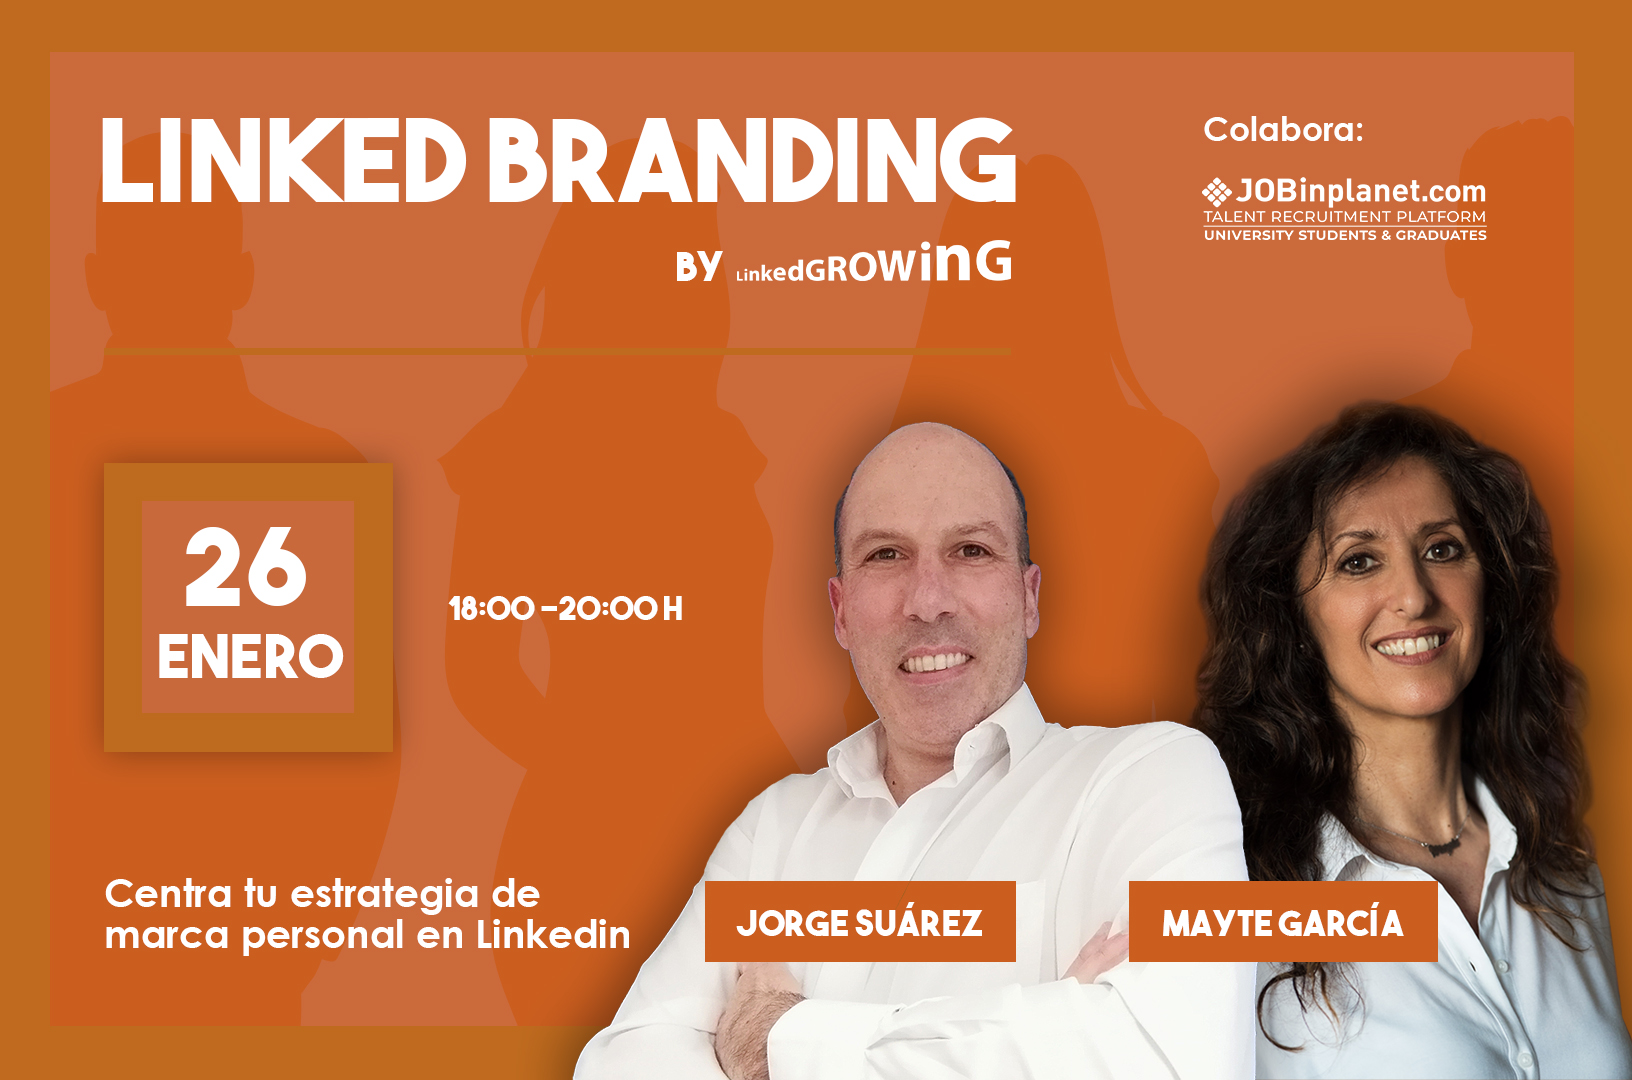 LinkedBranding, la fórmula para crear una estrategia de marca personal ganadora en LinkedIn